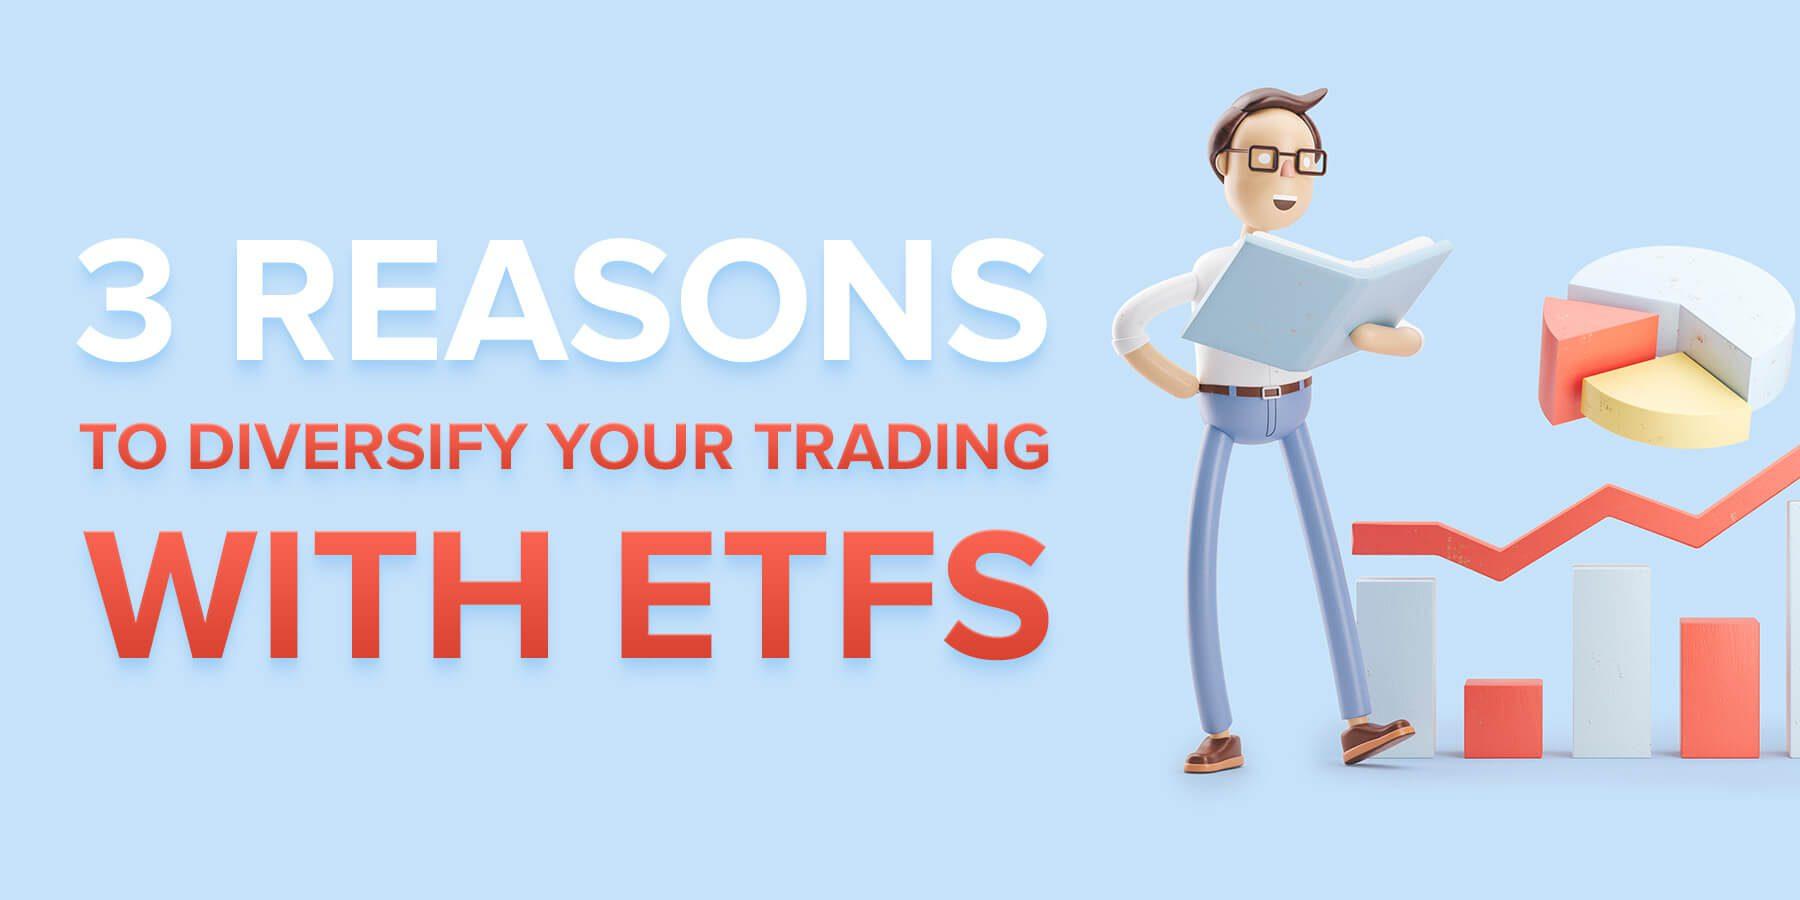 Diversify your trading portfolio with ETFs